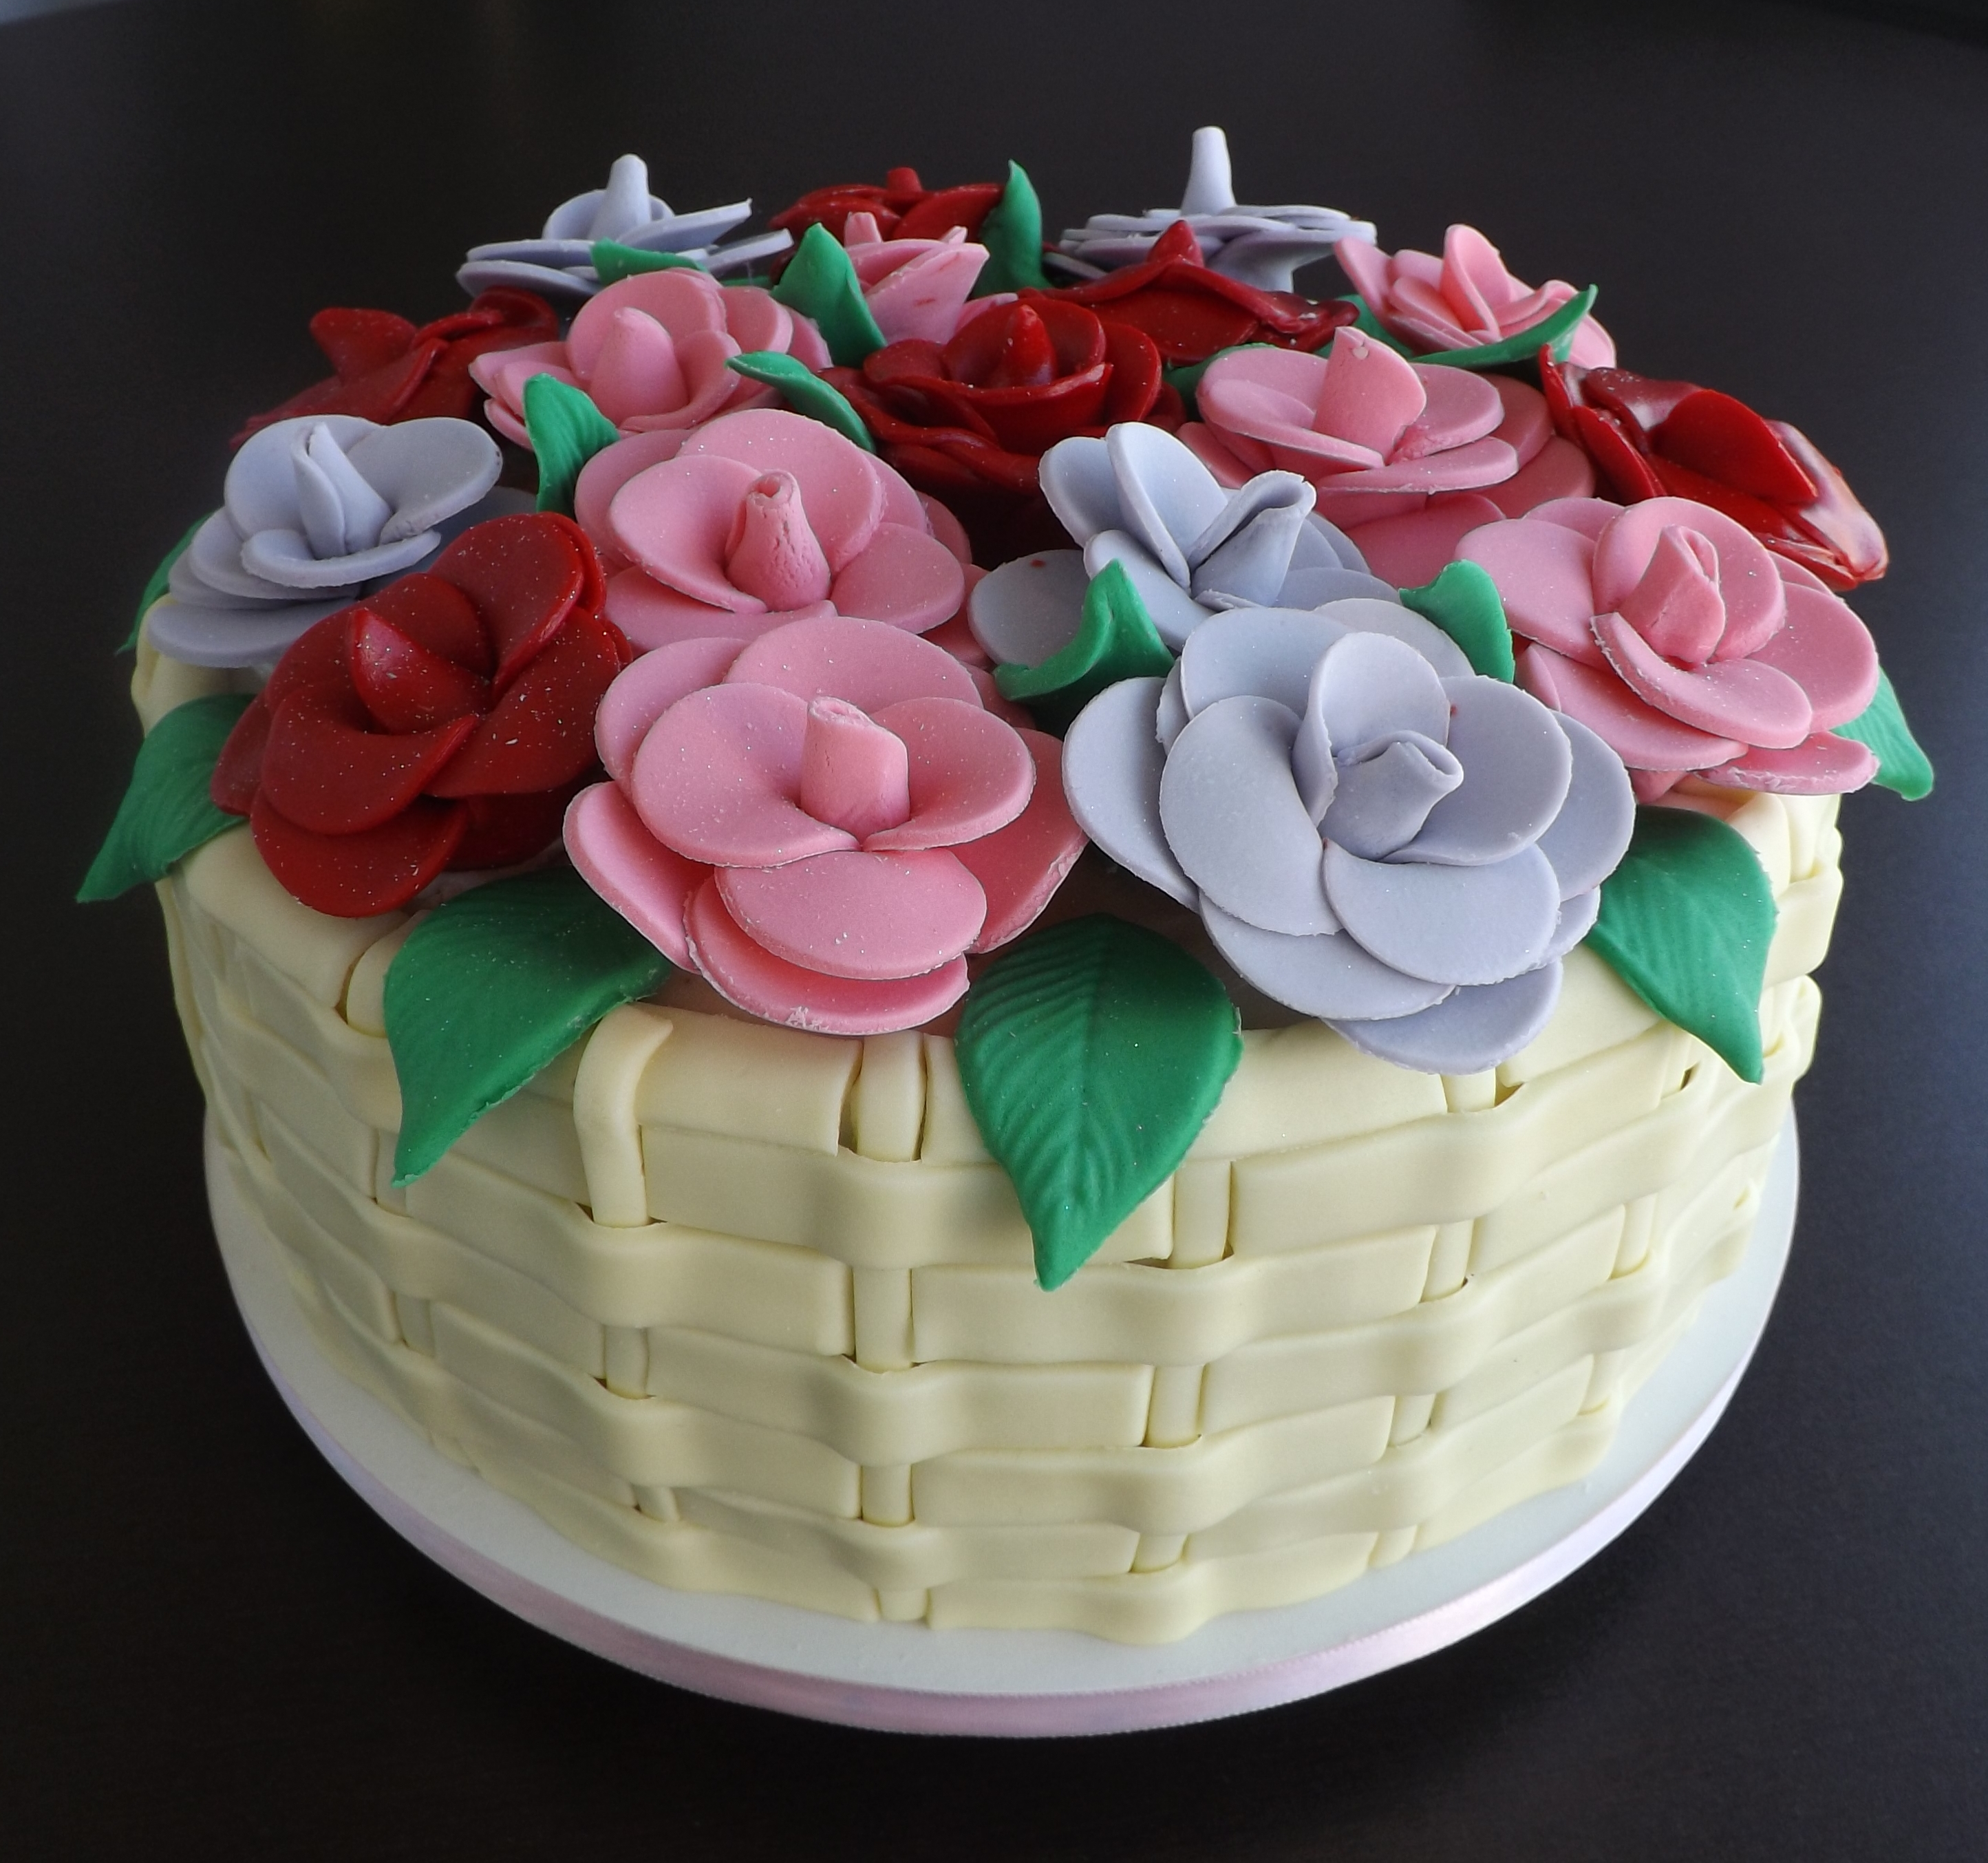 bolo de cesta de flores 2